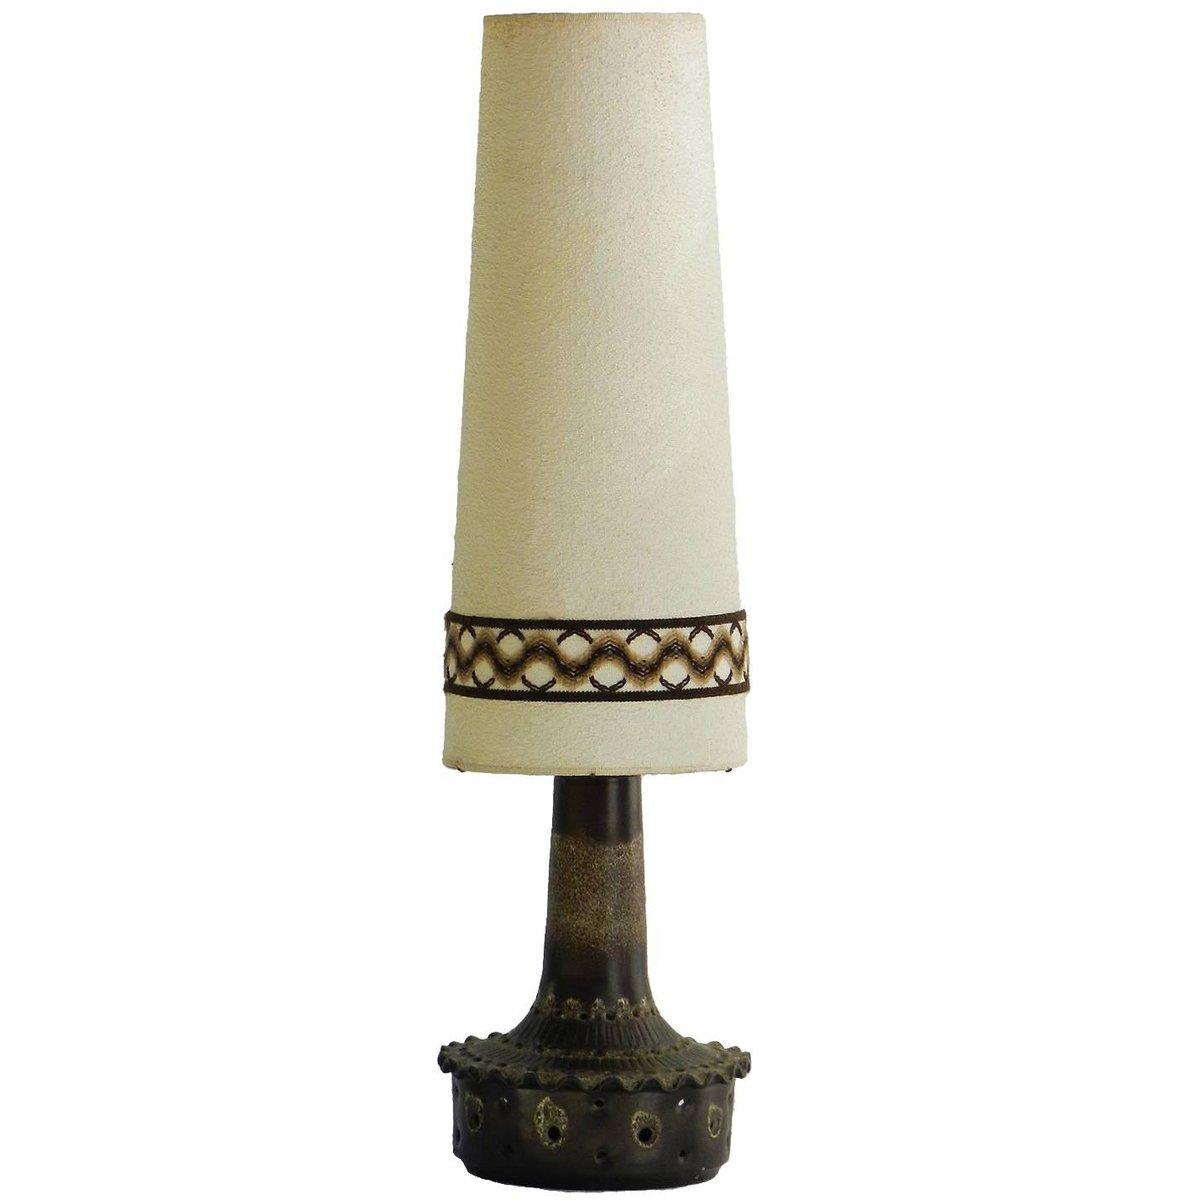 Große deutsche Mid-Century Lava Keramiklampe